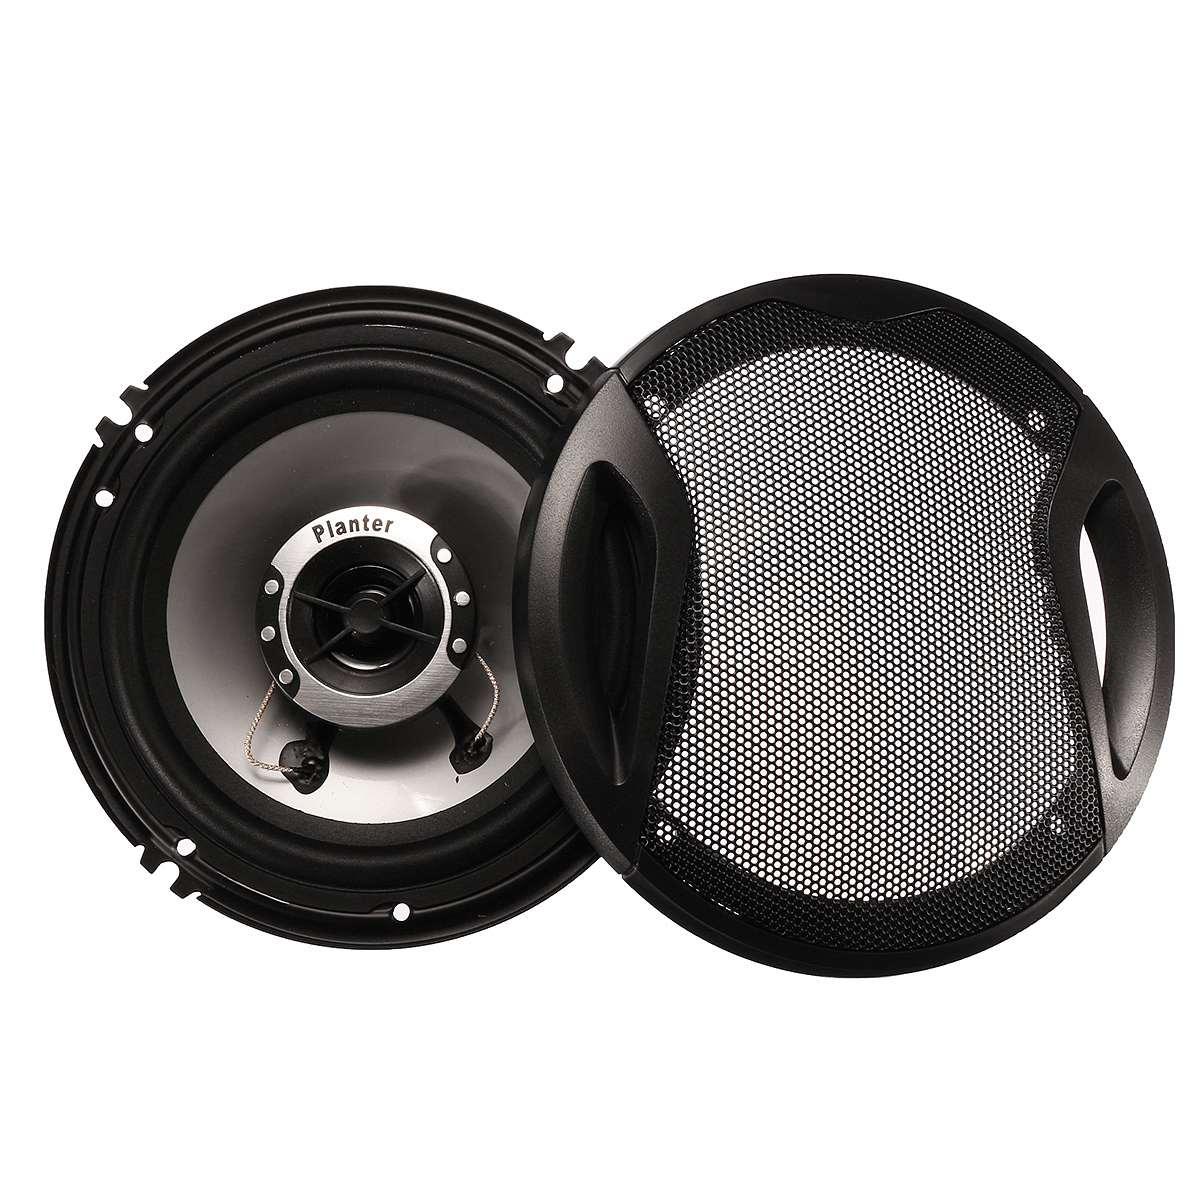 2pcs 6.5 Inch 400W Car Audio Speaker 4 Way Coaxial Loud Speaker Universal Vehicle Auto Audio Music Stereo Hifi Loudspeakers